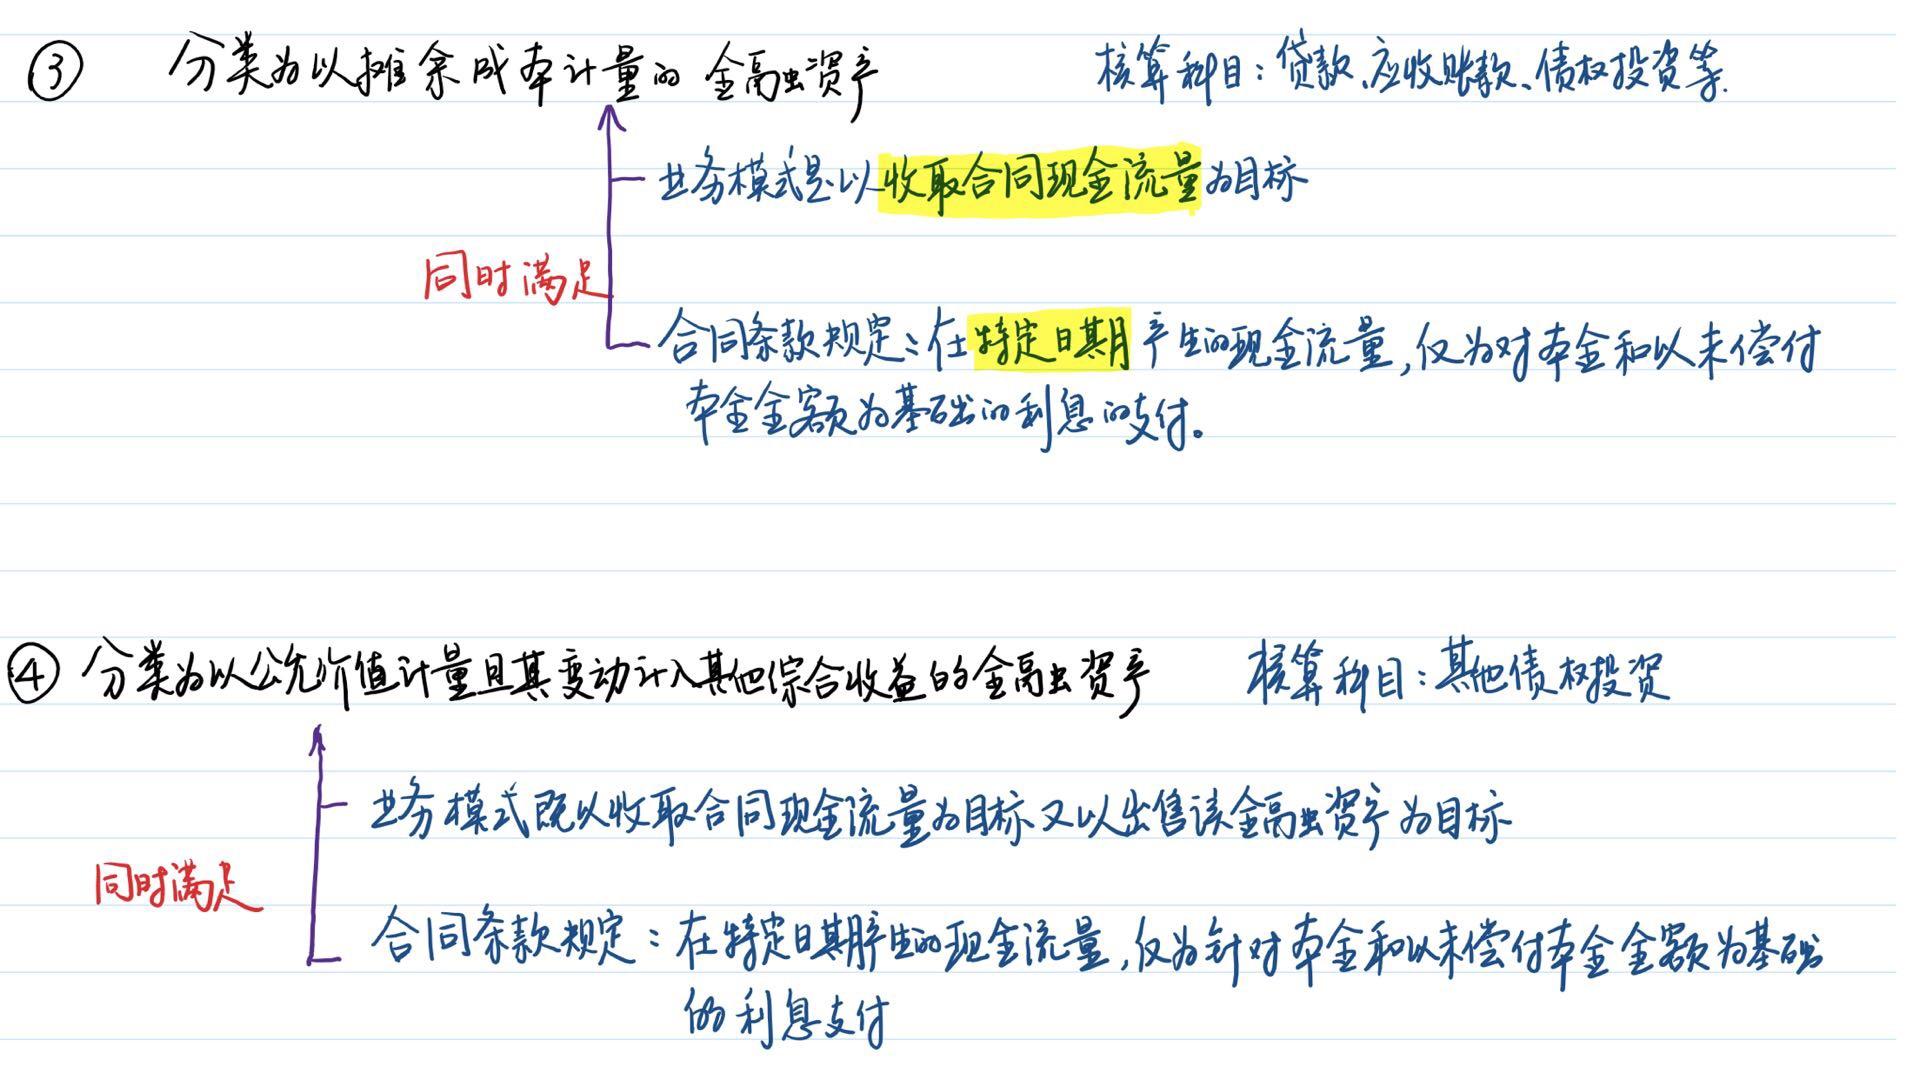 tmp_7098c97e1f648bdbb7d3892aa1cef3af.jpg